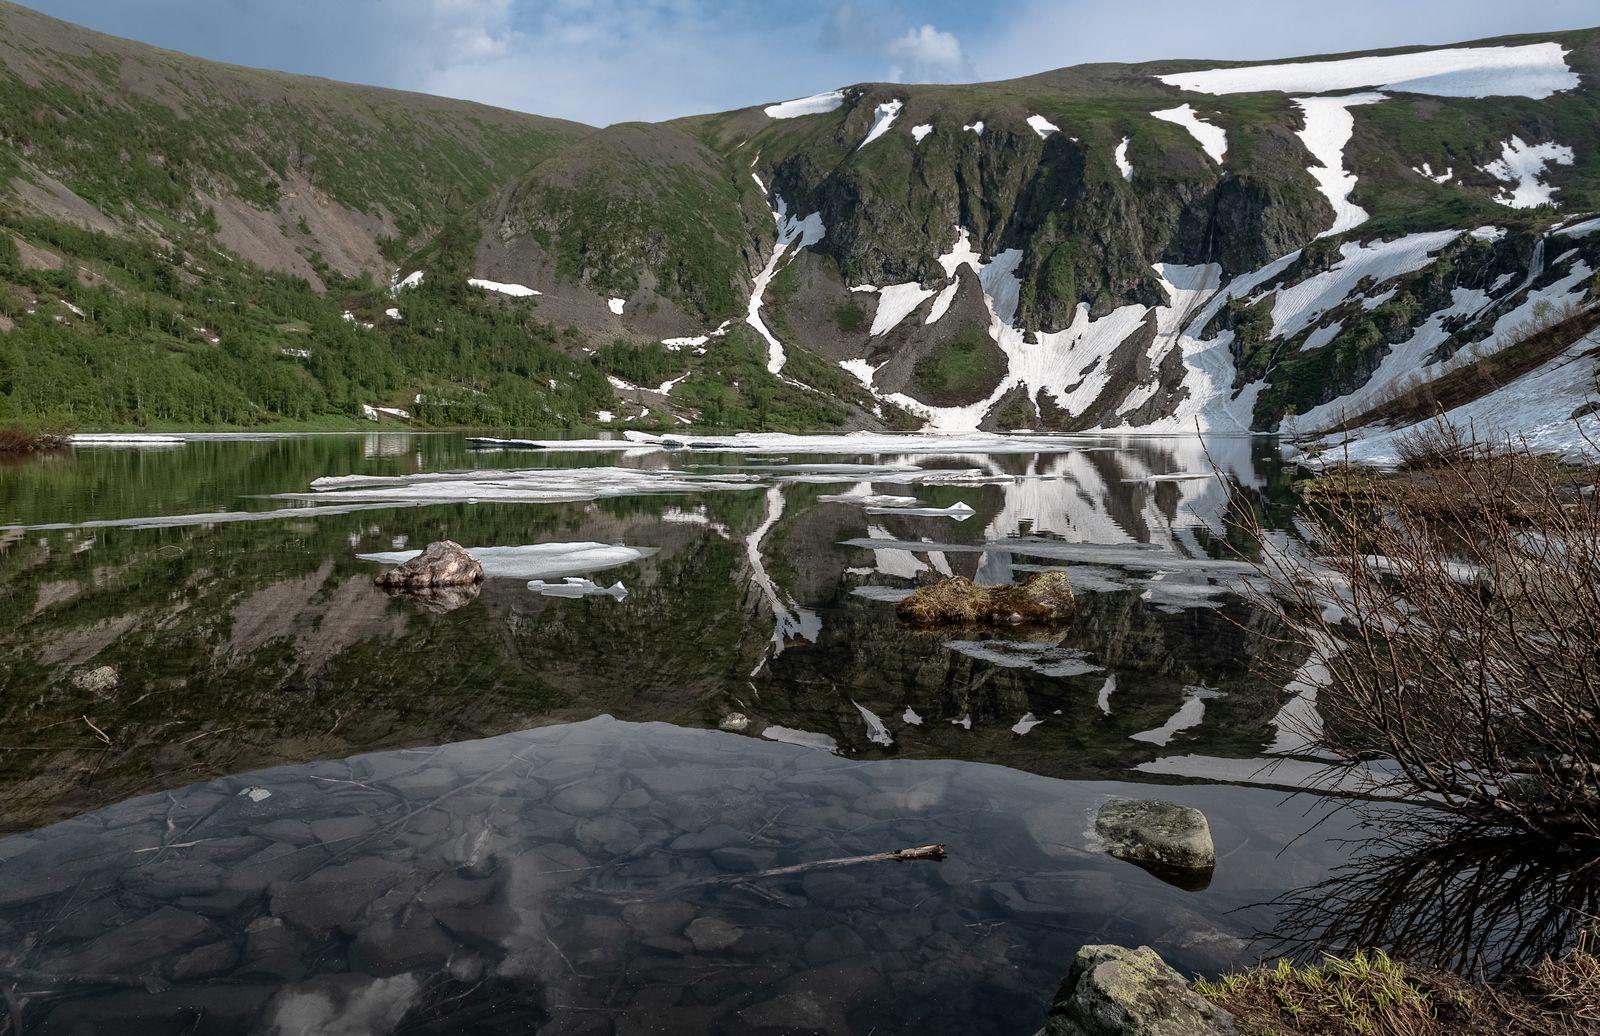 Ивановские озера. Хакасия Ивановские озера июнь 2021